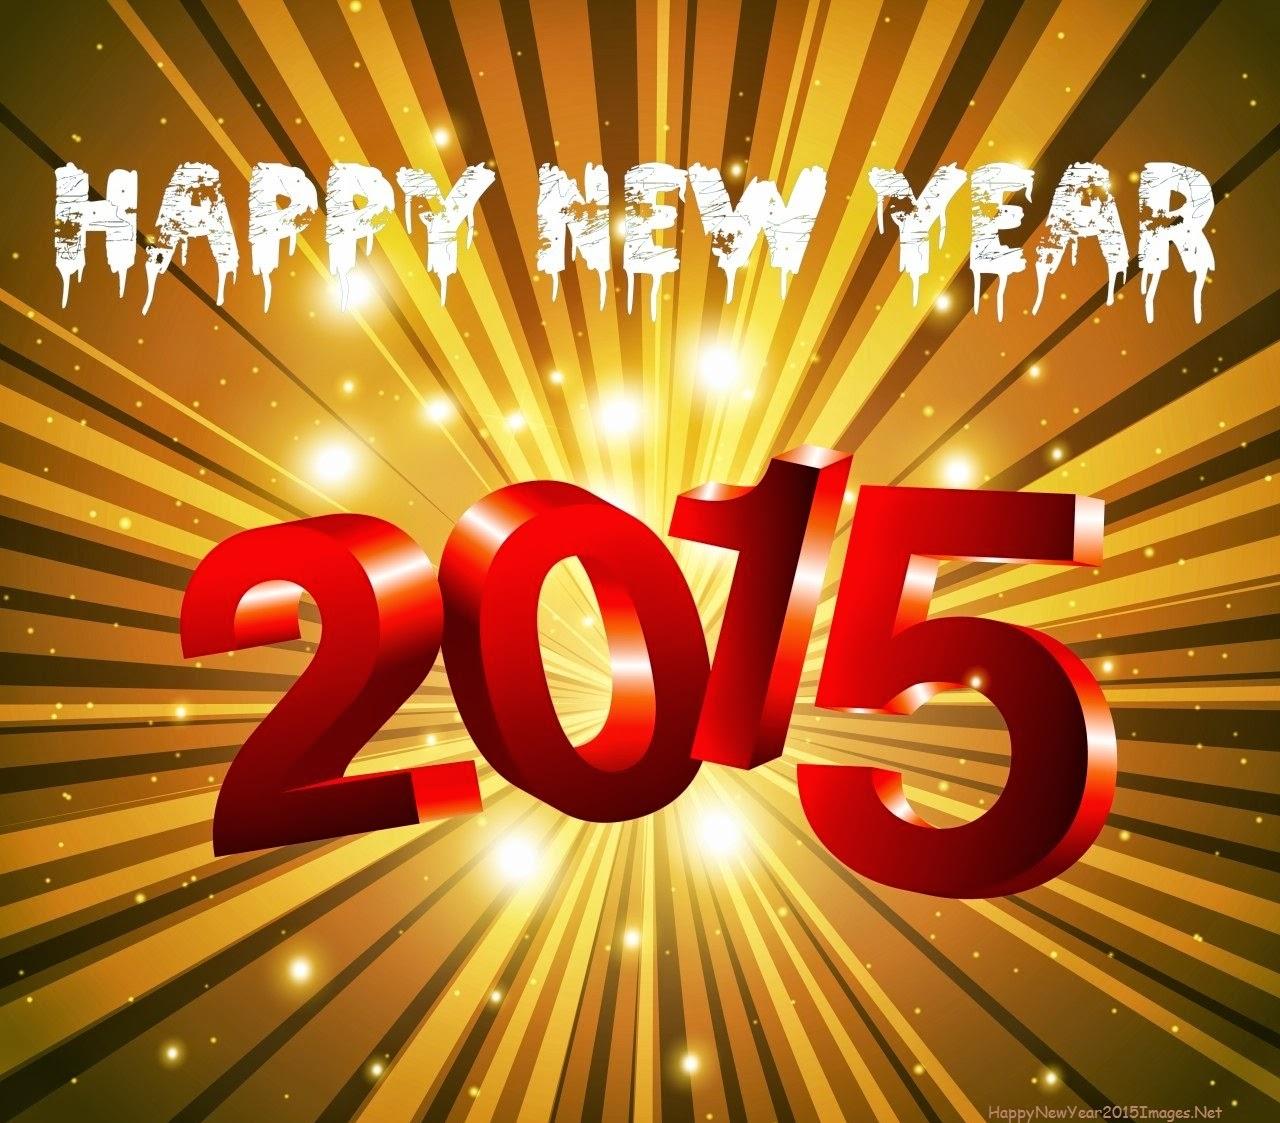 Happy New Year 2015 1280x1123